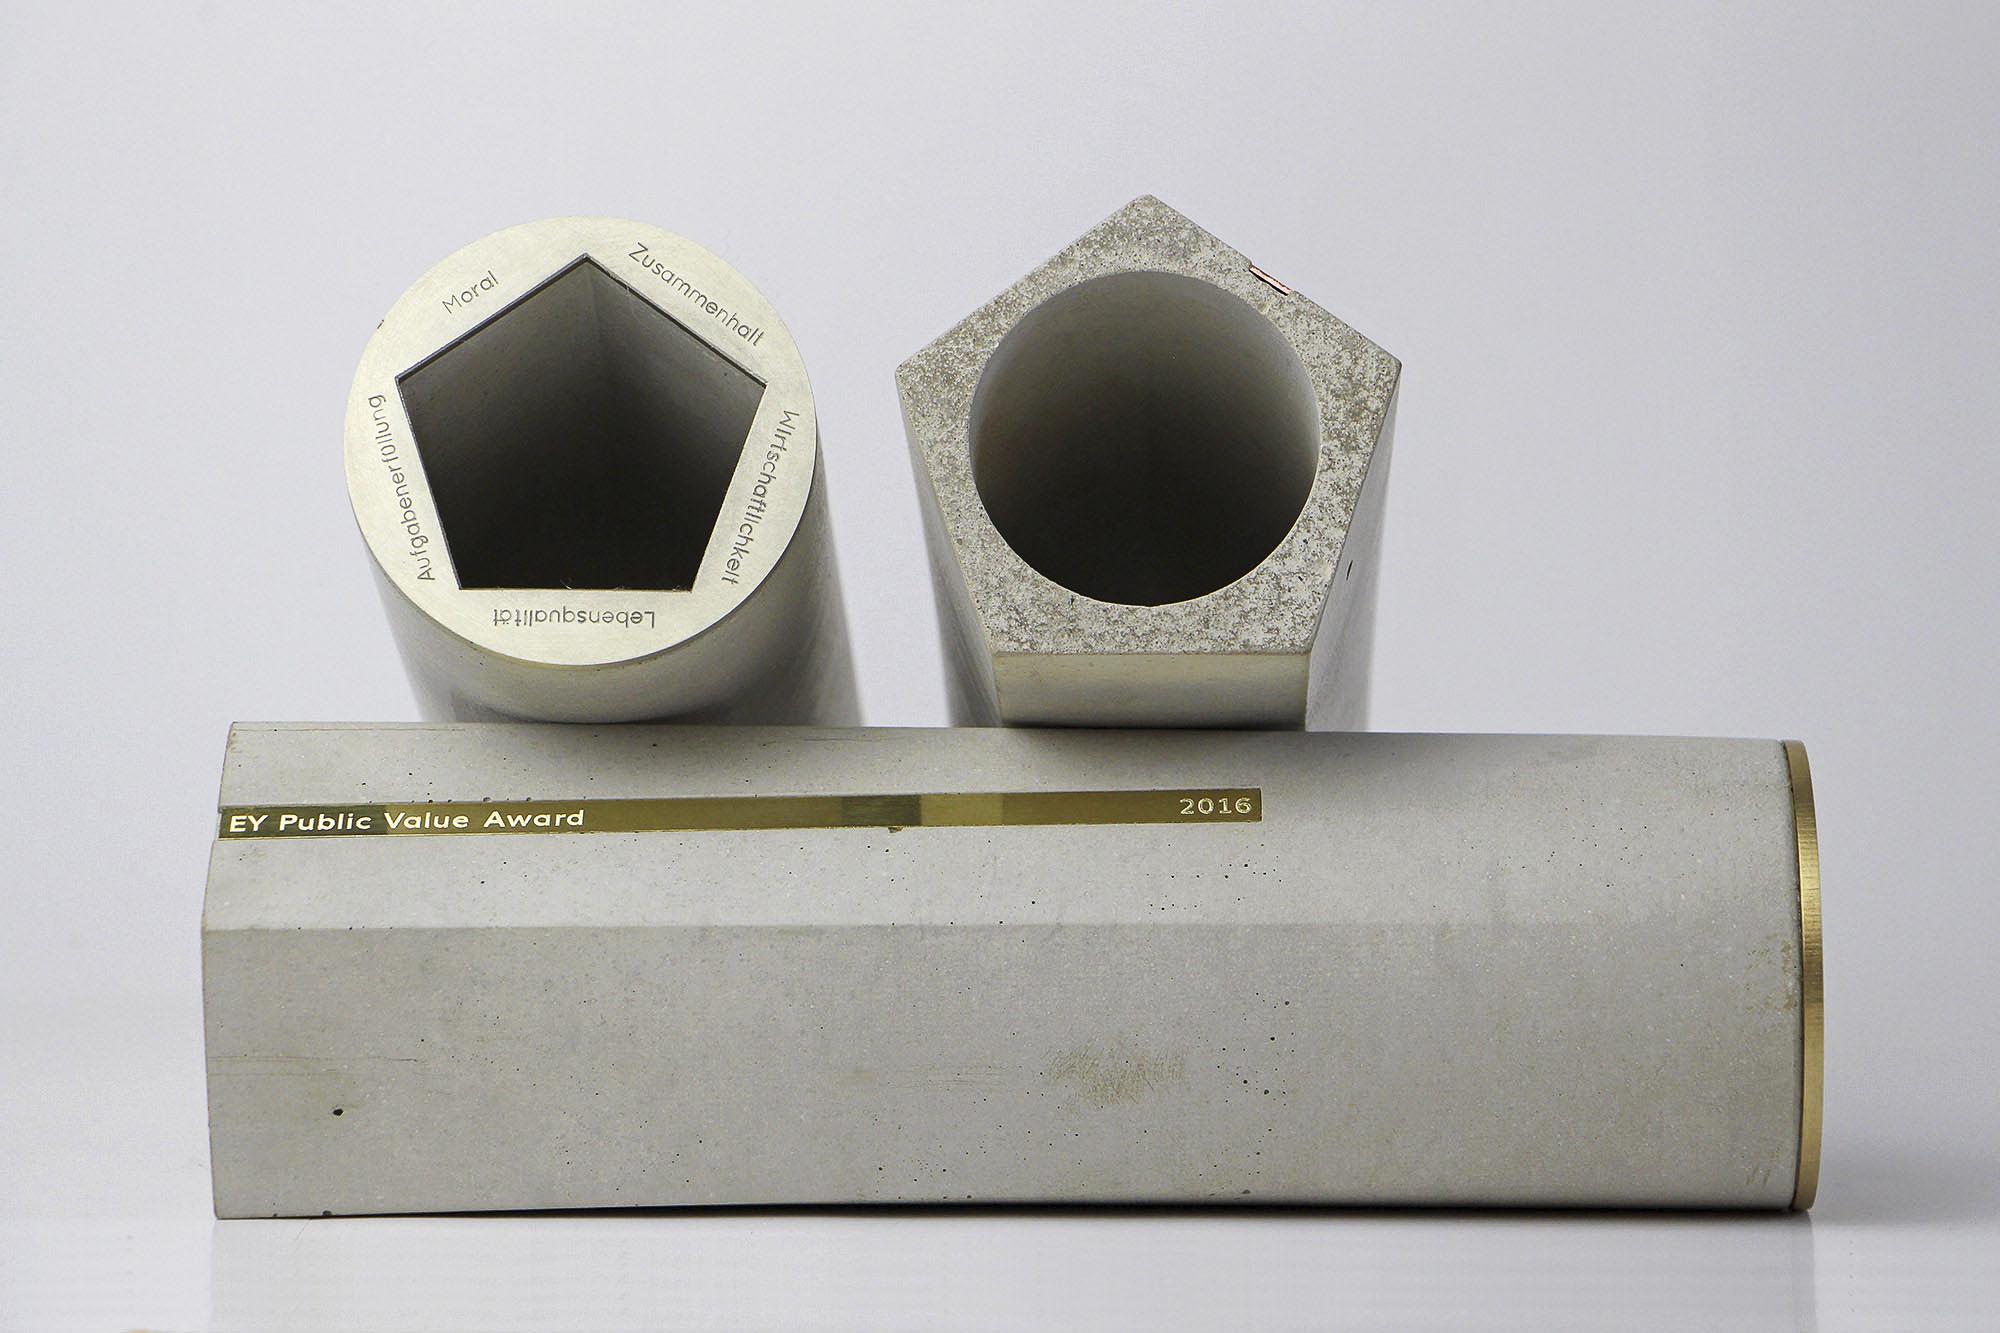 EY Public Value Award / Bild: formikat GbR